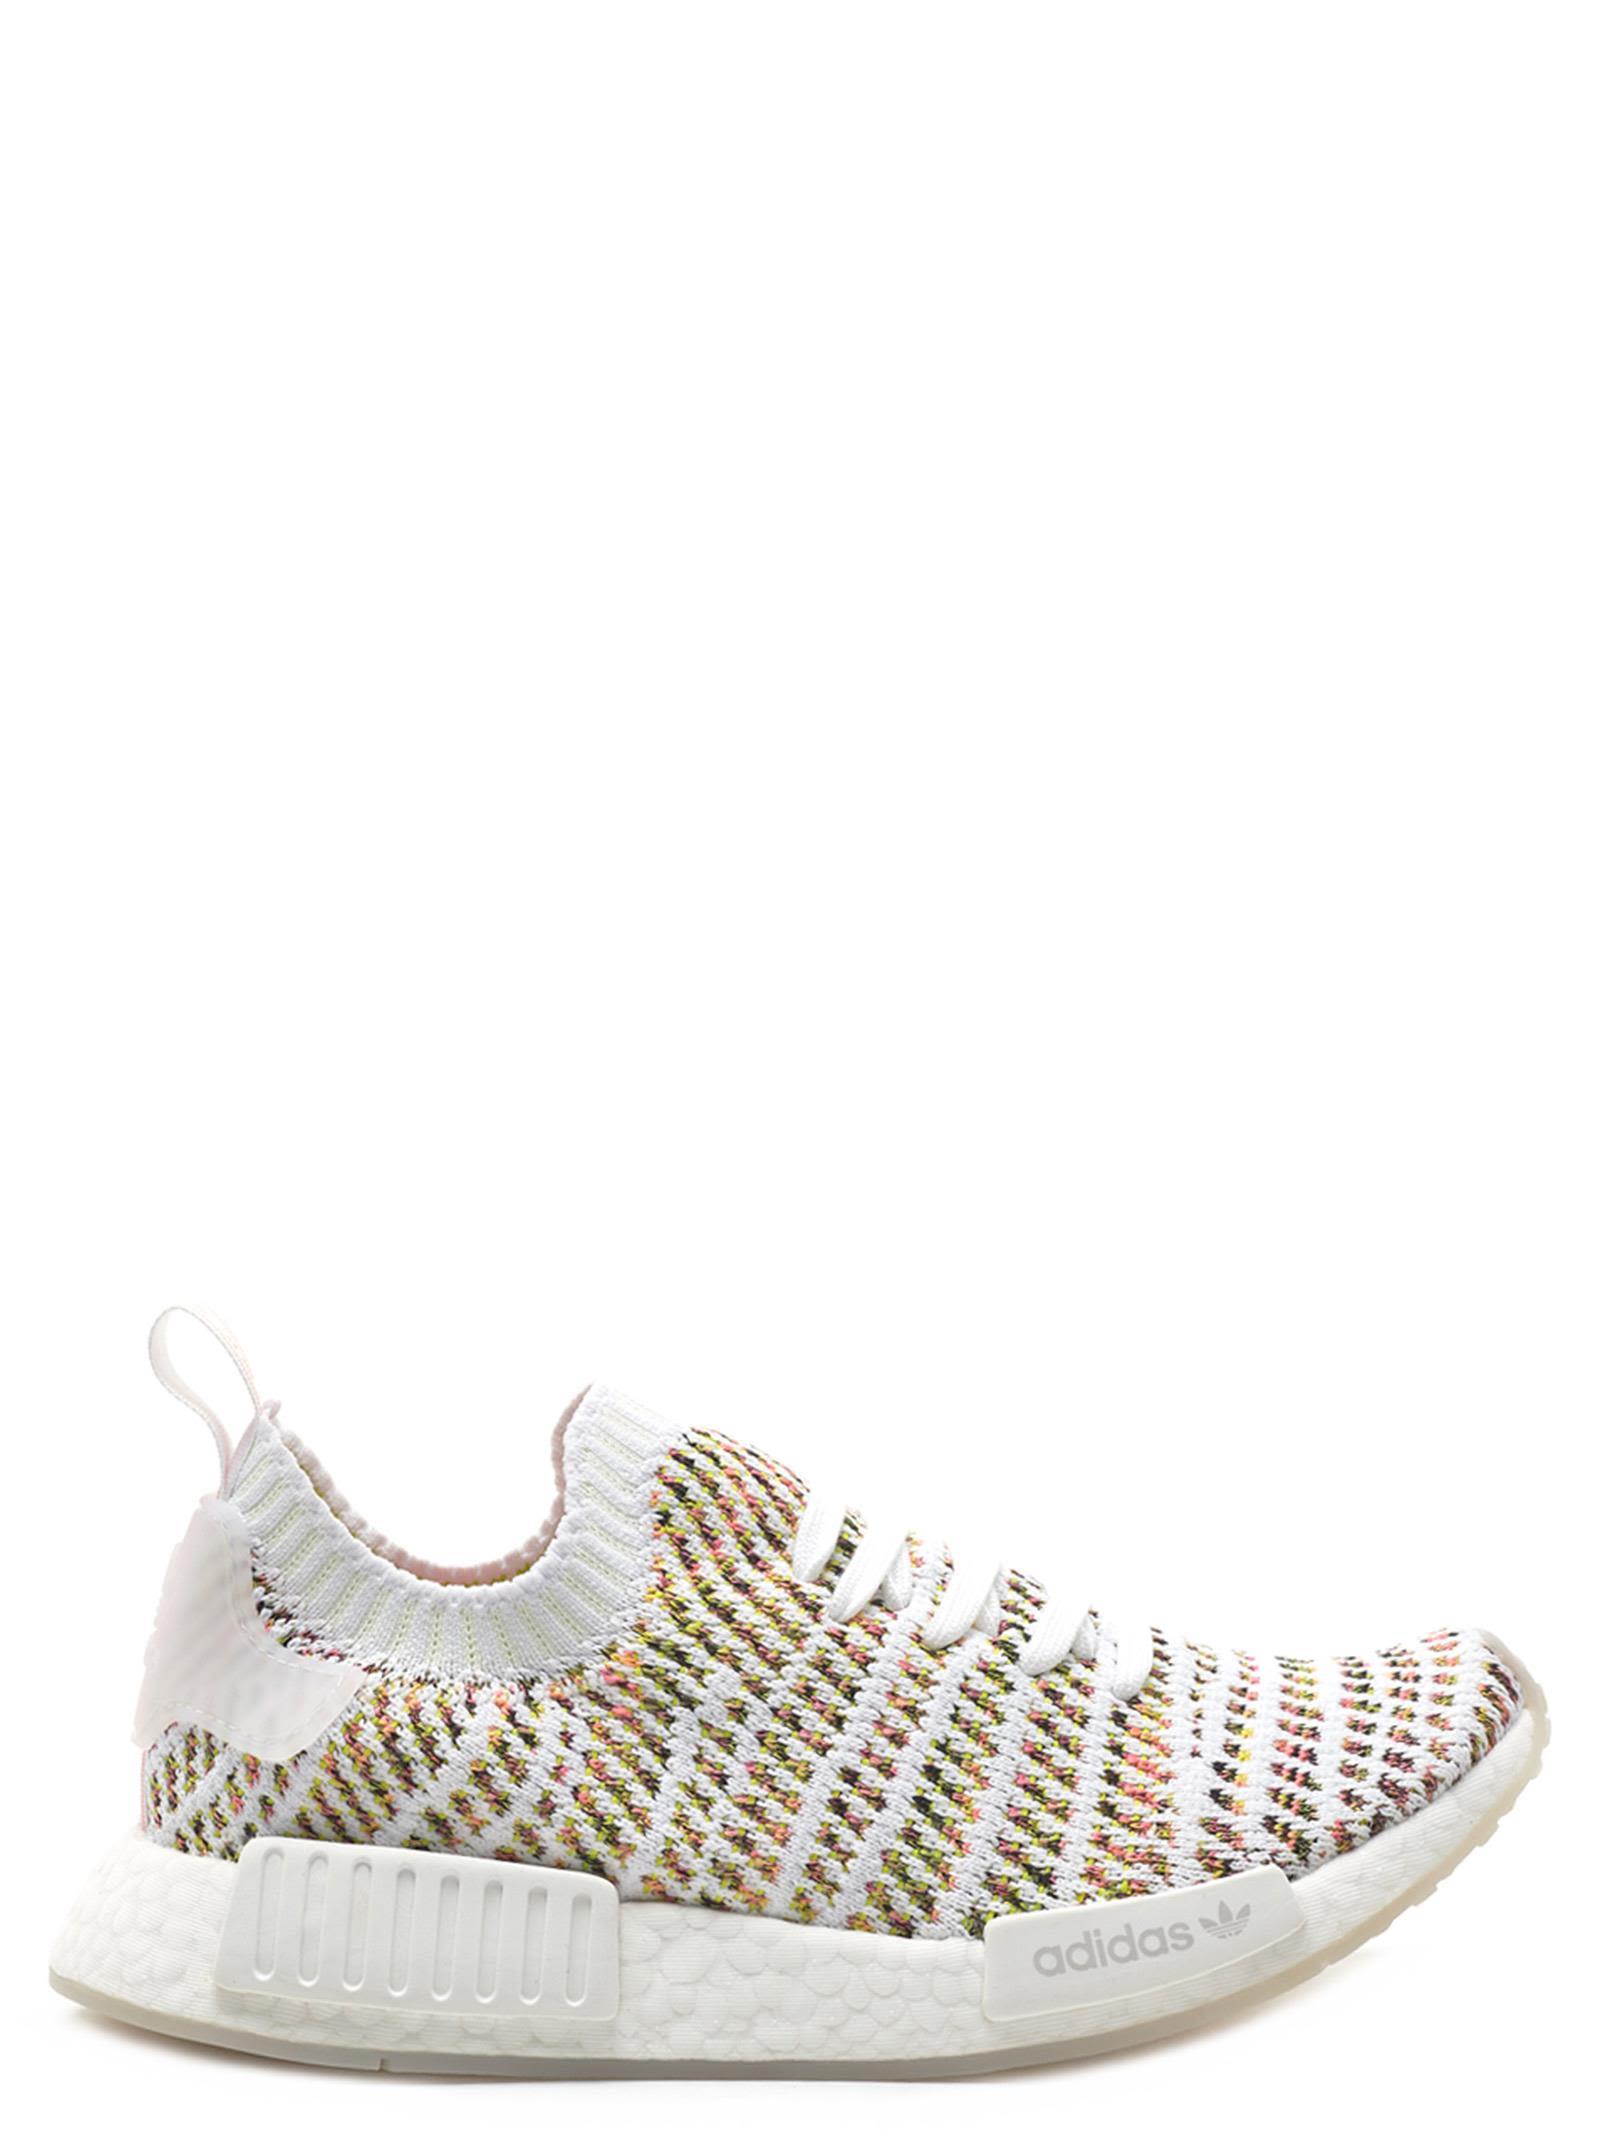 free shipping 05042 48f96 Adidas Originals  nmd R1  Shoes ...